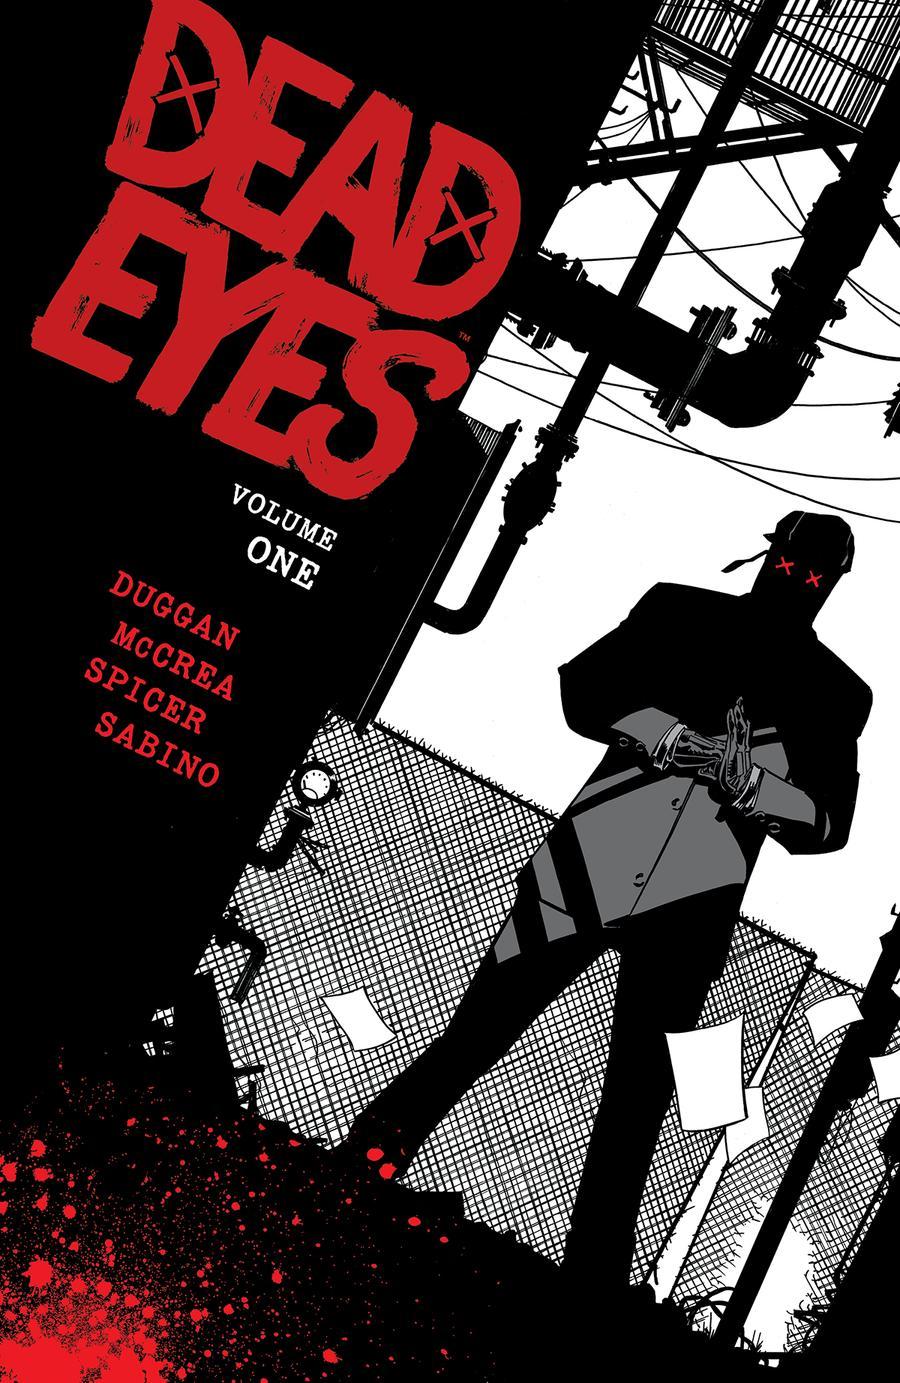 Dead Eyes Vol 1 TP